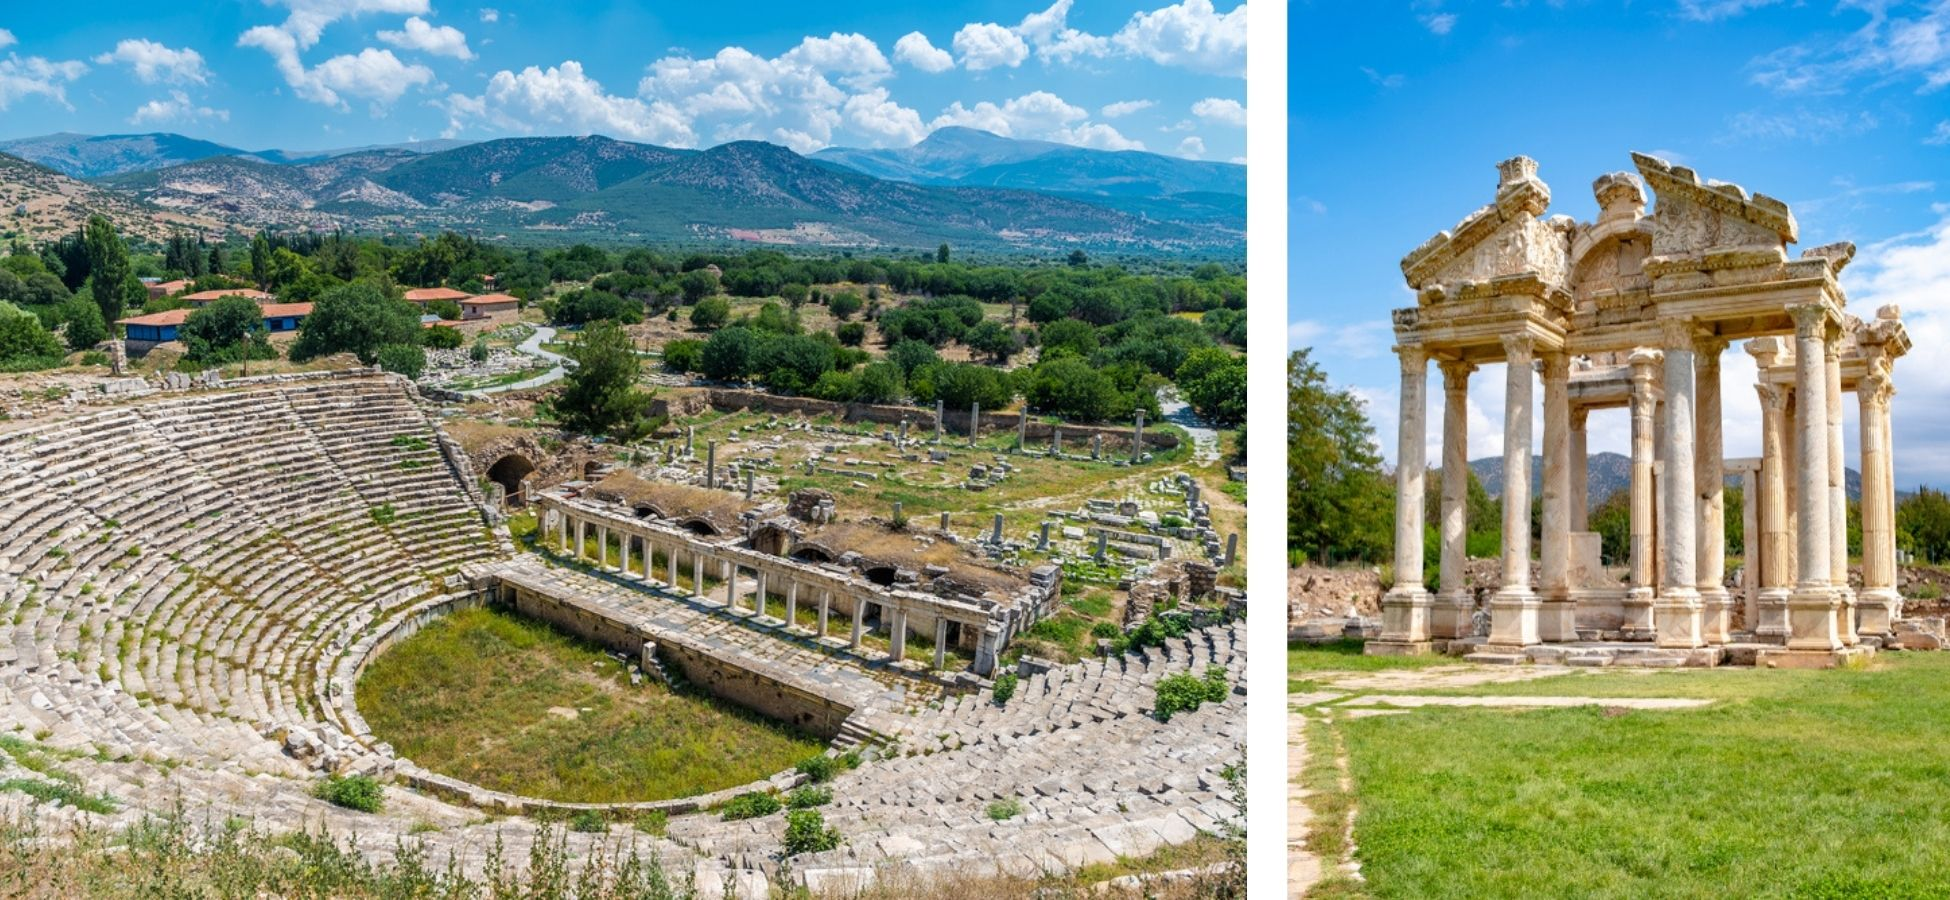 turquie-sites-archeologiques